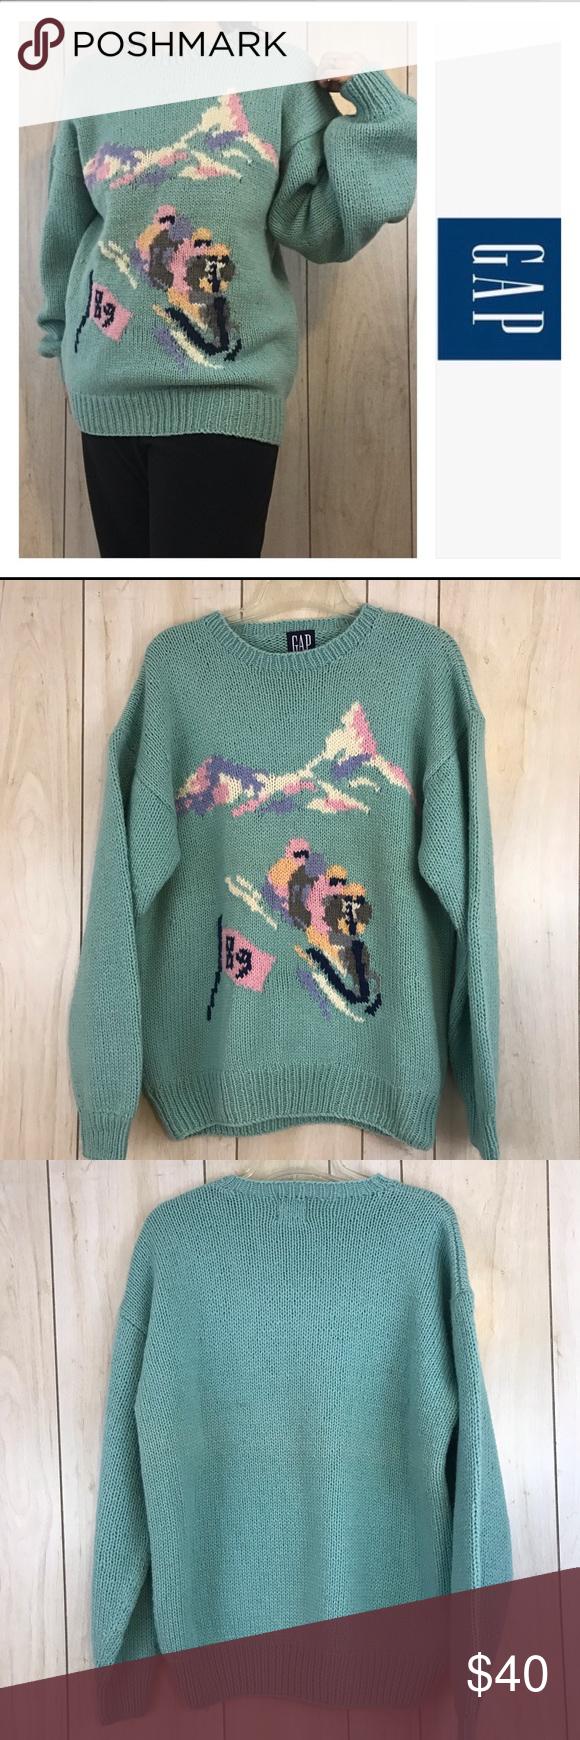 a2f59837b Vintage GAP Sledding Oversized Wool Sweater